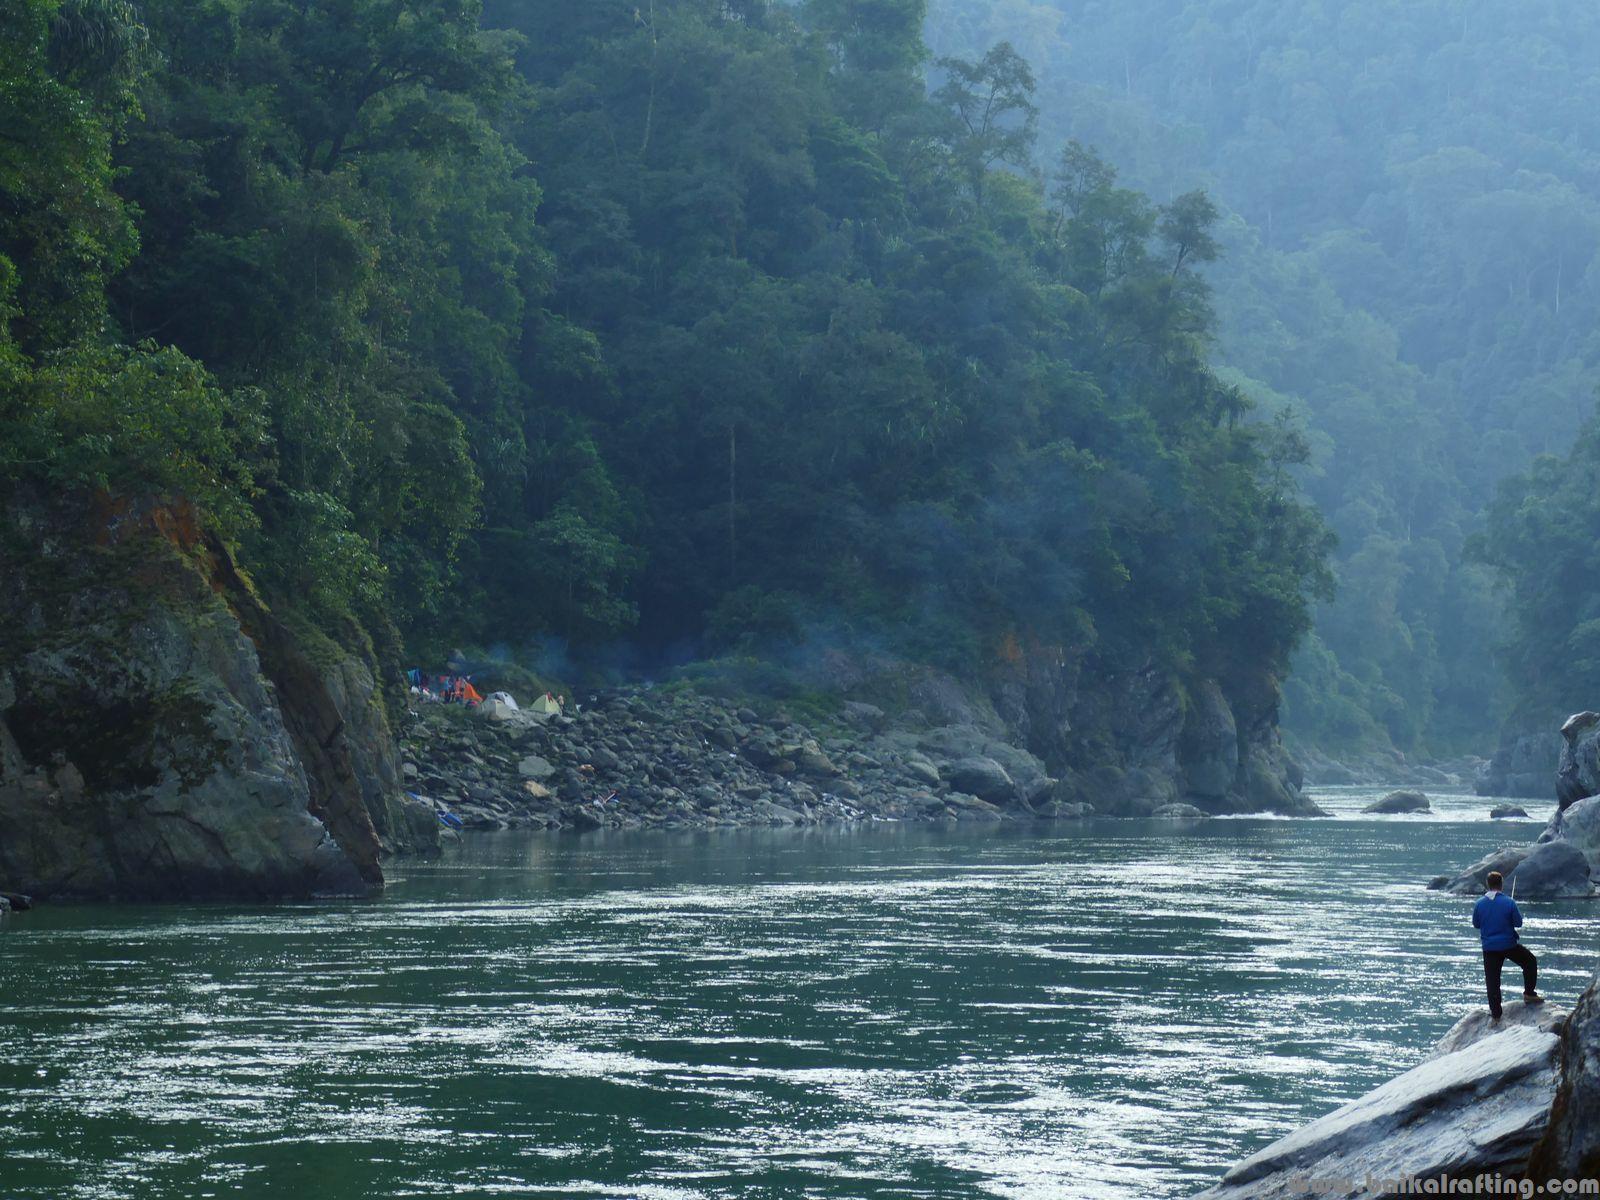 Сплав в Гималаях. Рыбалка на реке.